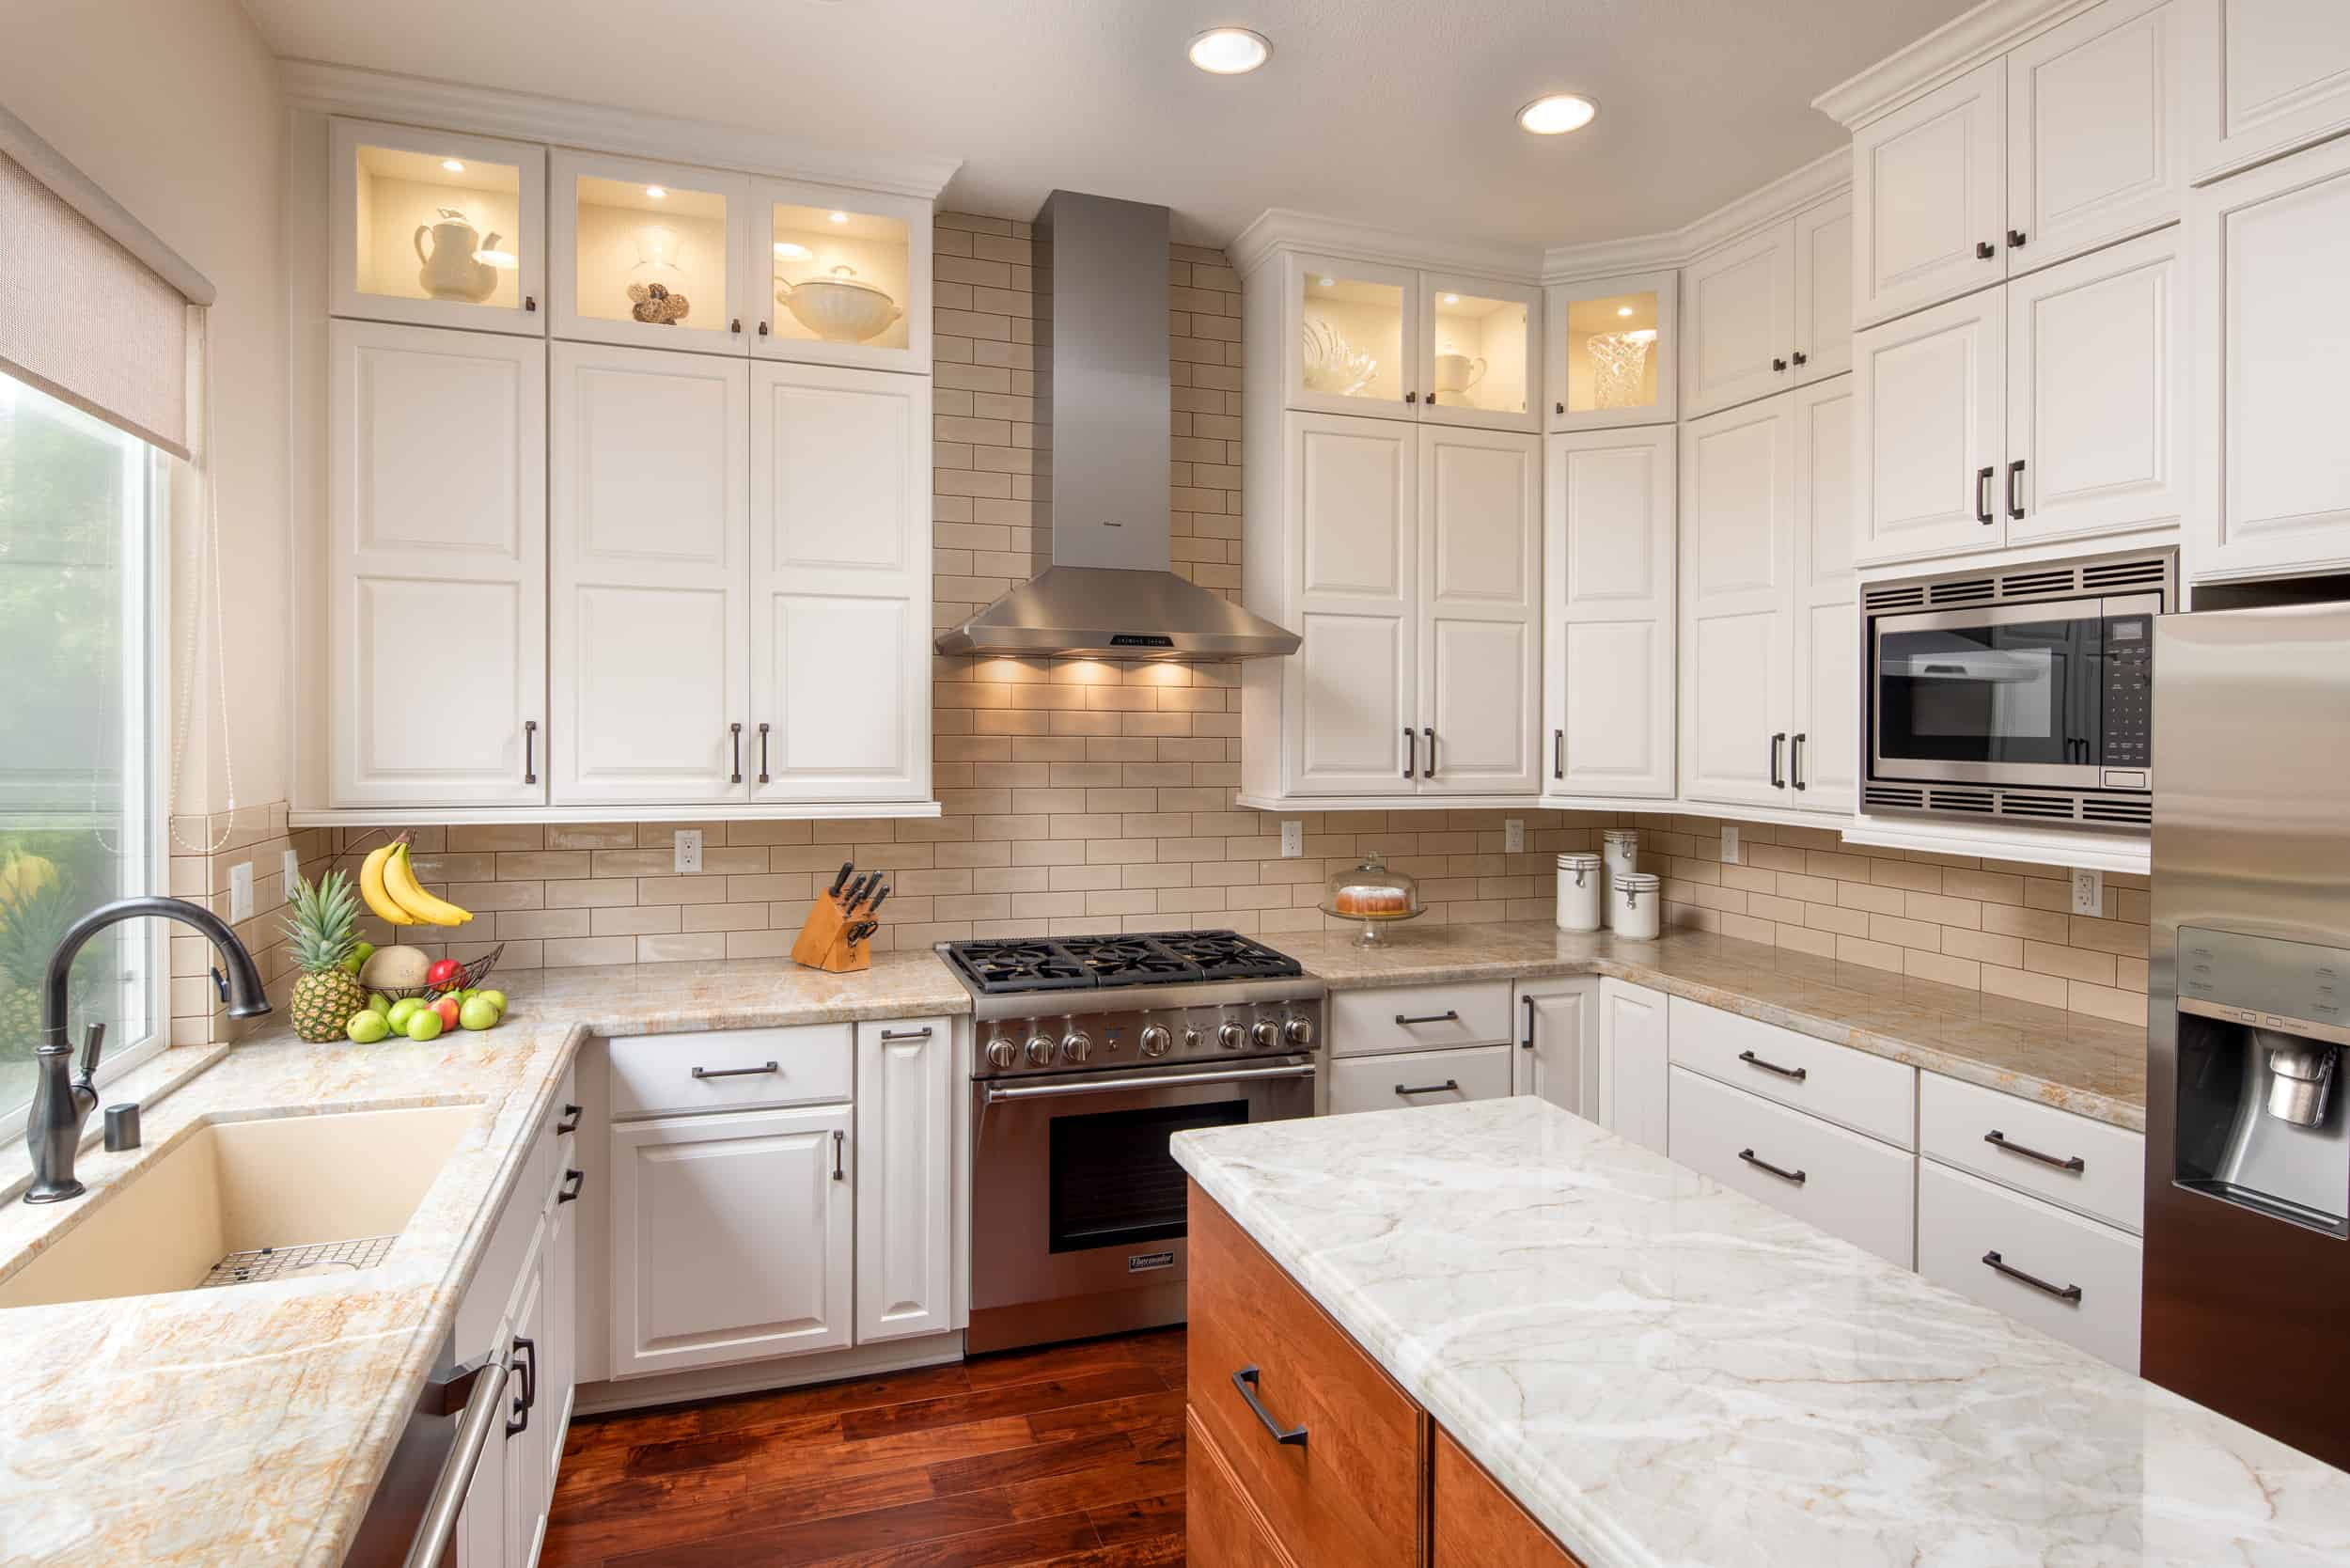 Kitchen Remodeling Ideas Renovation Gallery Remodel Works